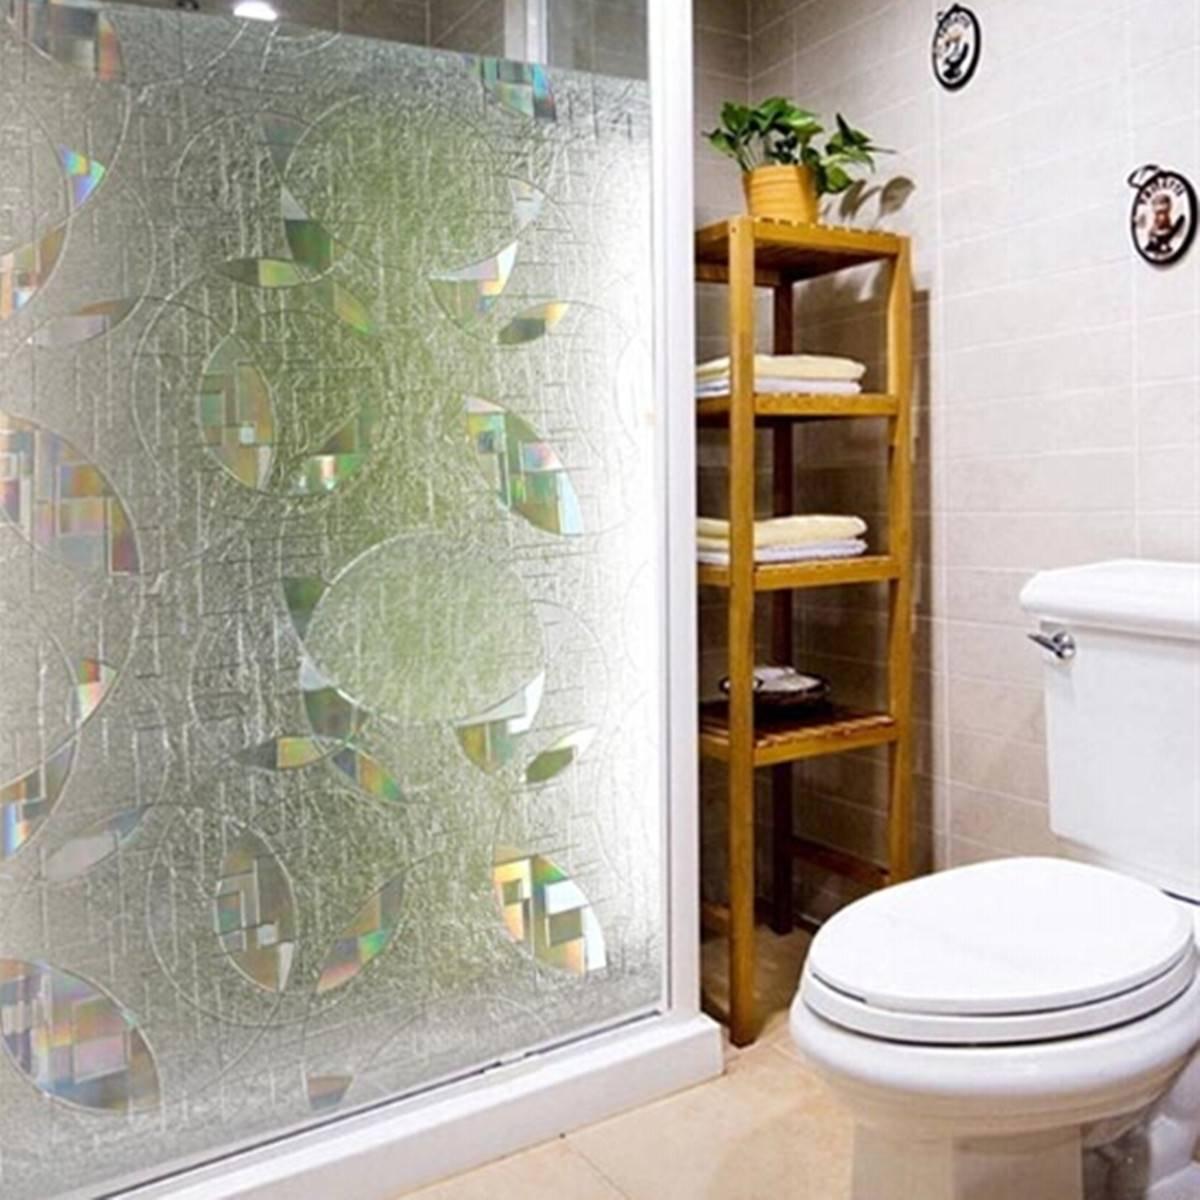 KING DO WAY 3D Static Fensterfolie Sichtschutzfolie Glasfenster-Papier Glasfenster-Papier Glasfenster-Papier Frosted UV Datenschutz 2c1bad